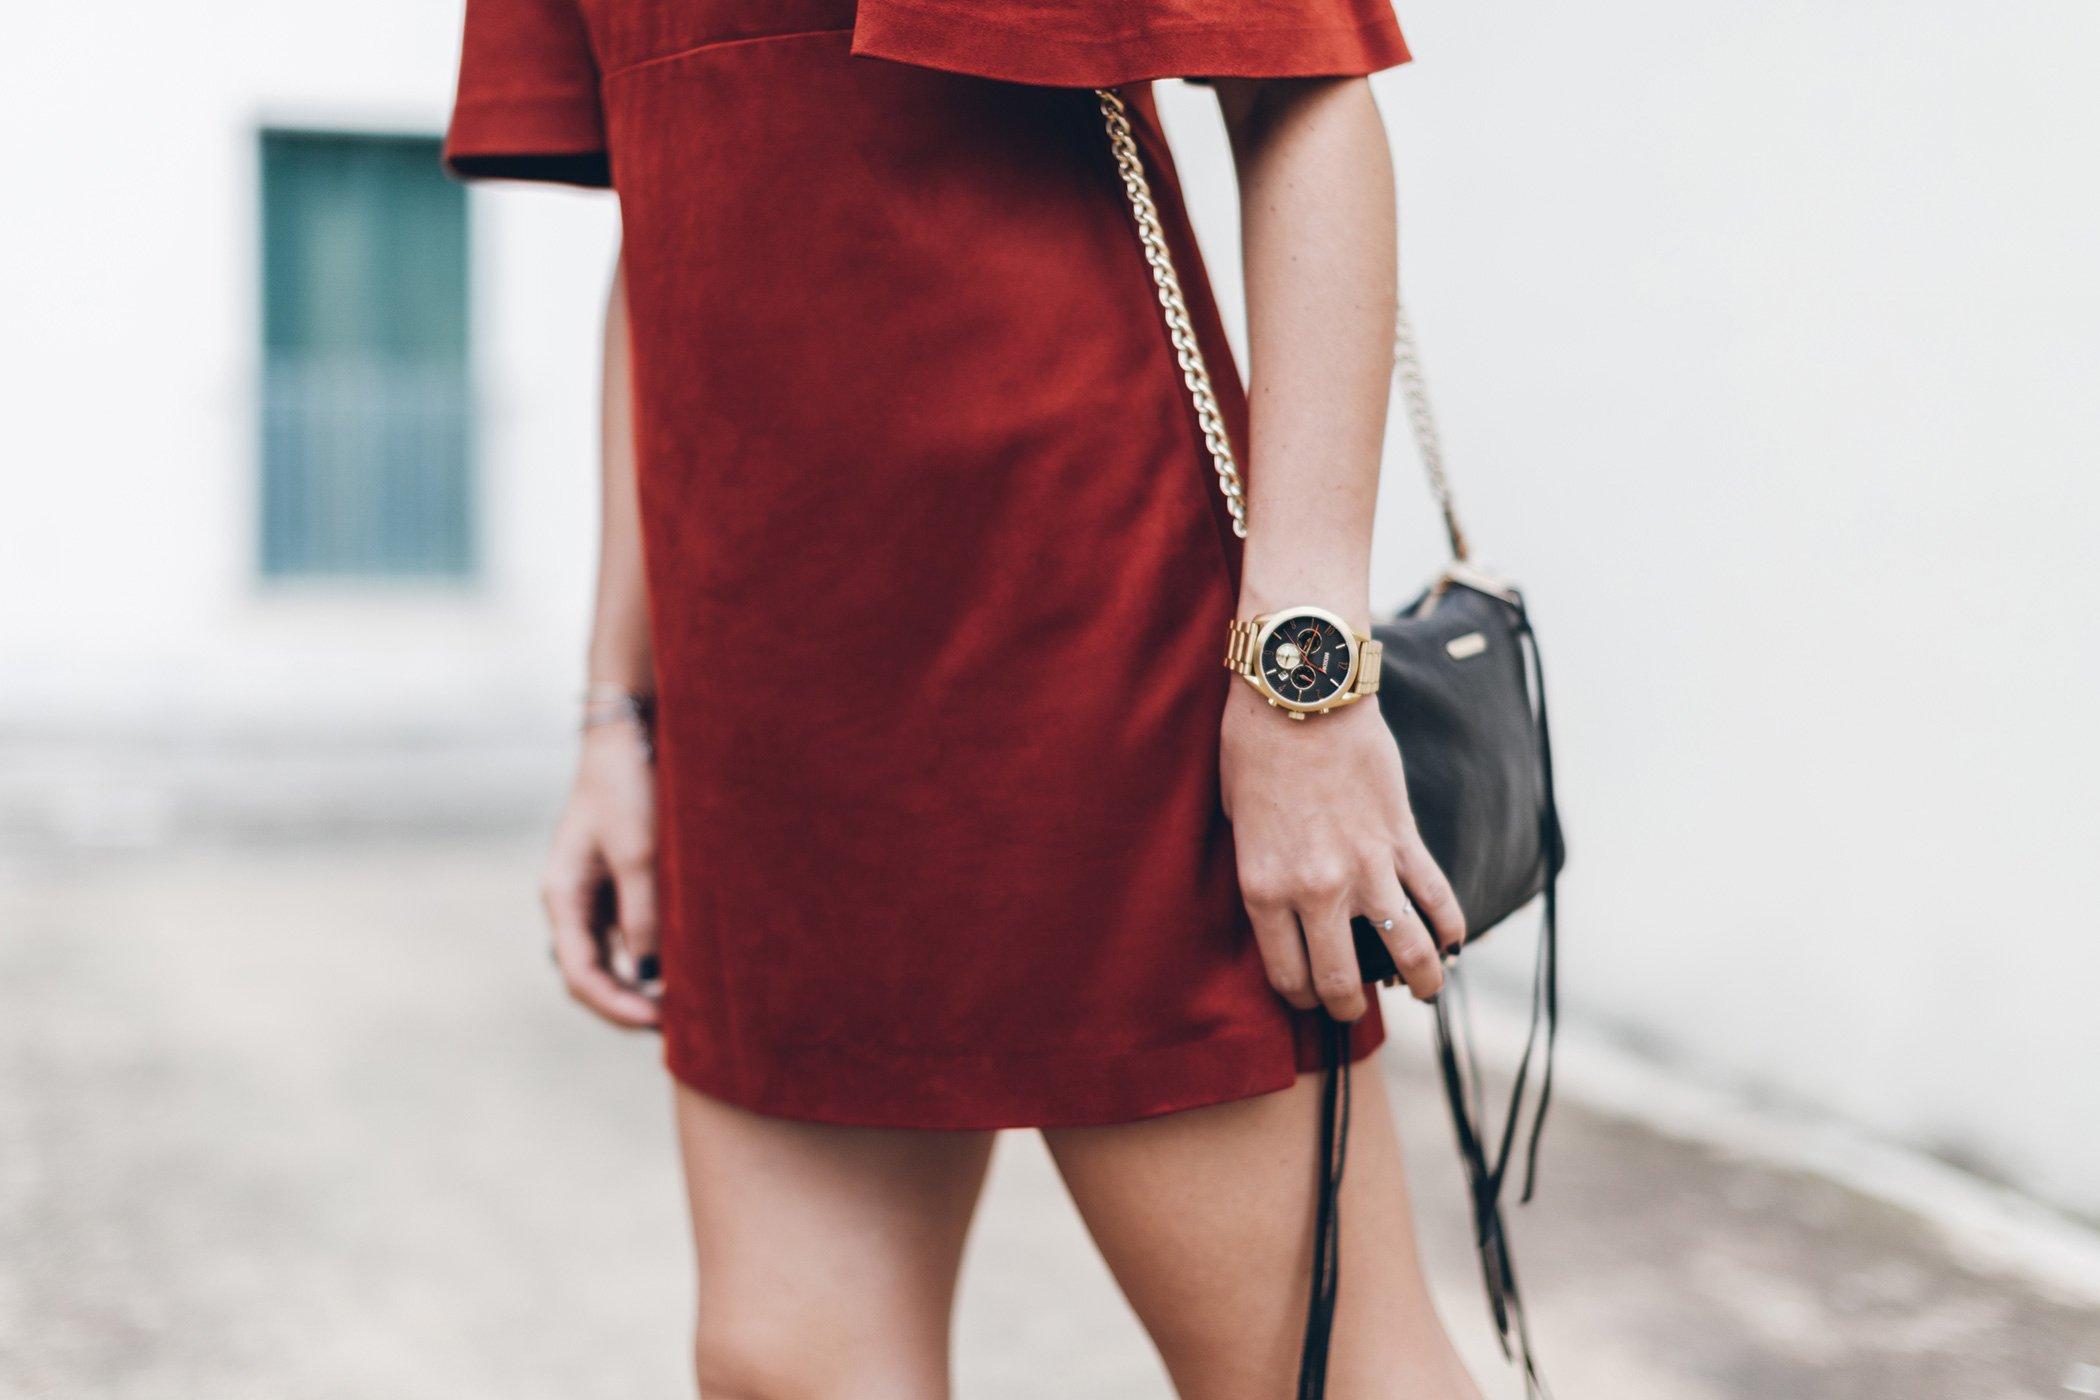 mikuta-red-suede-dress-4